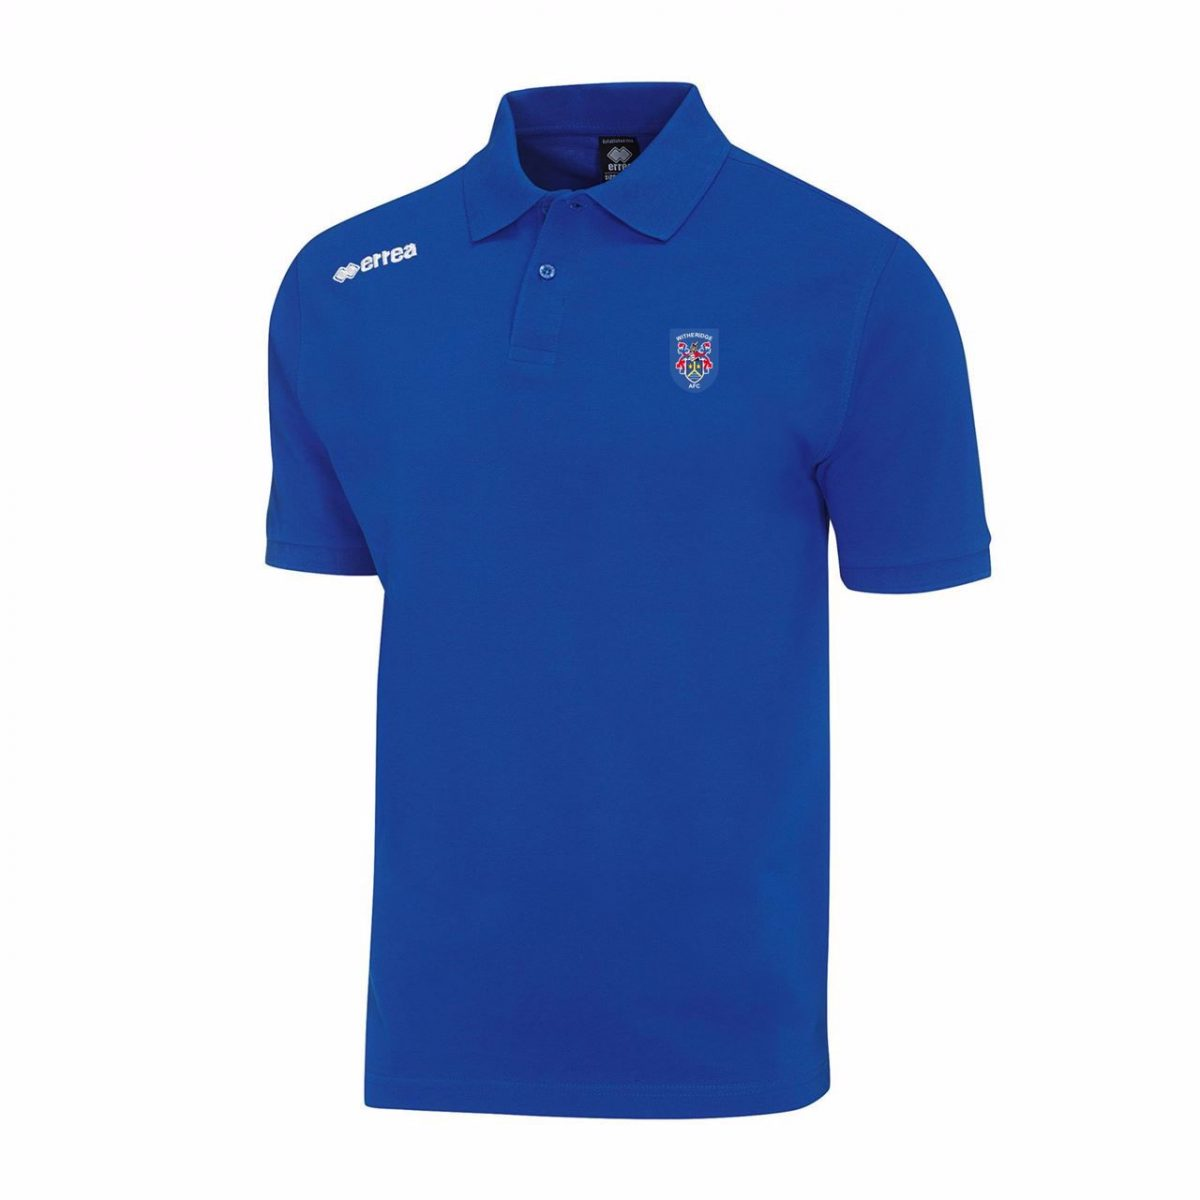 Witheridge Football Club Polo Shirt - Royal - Junior